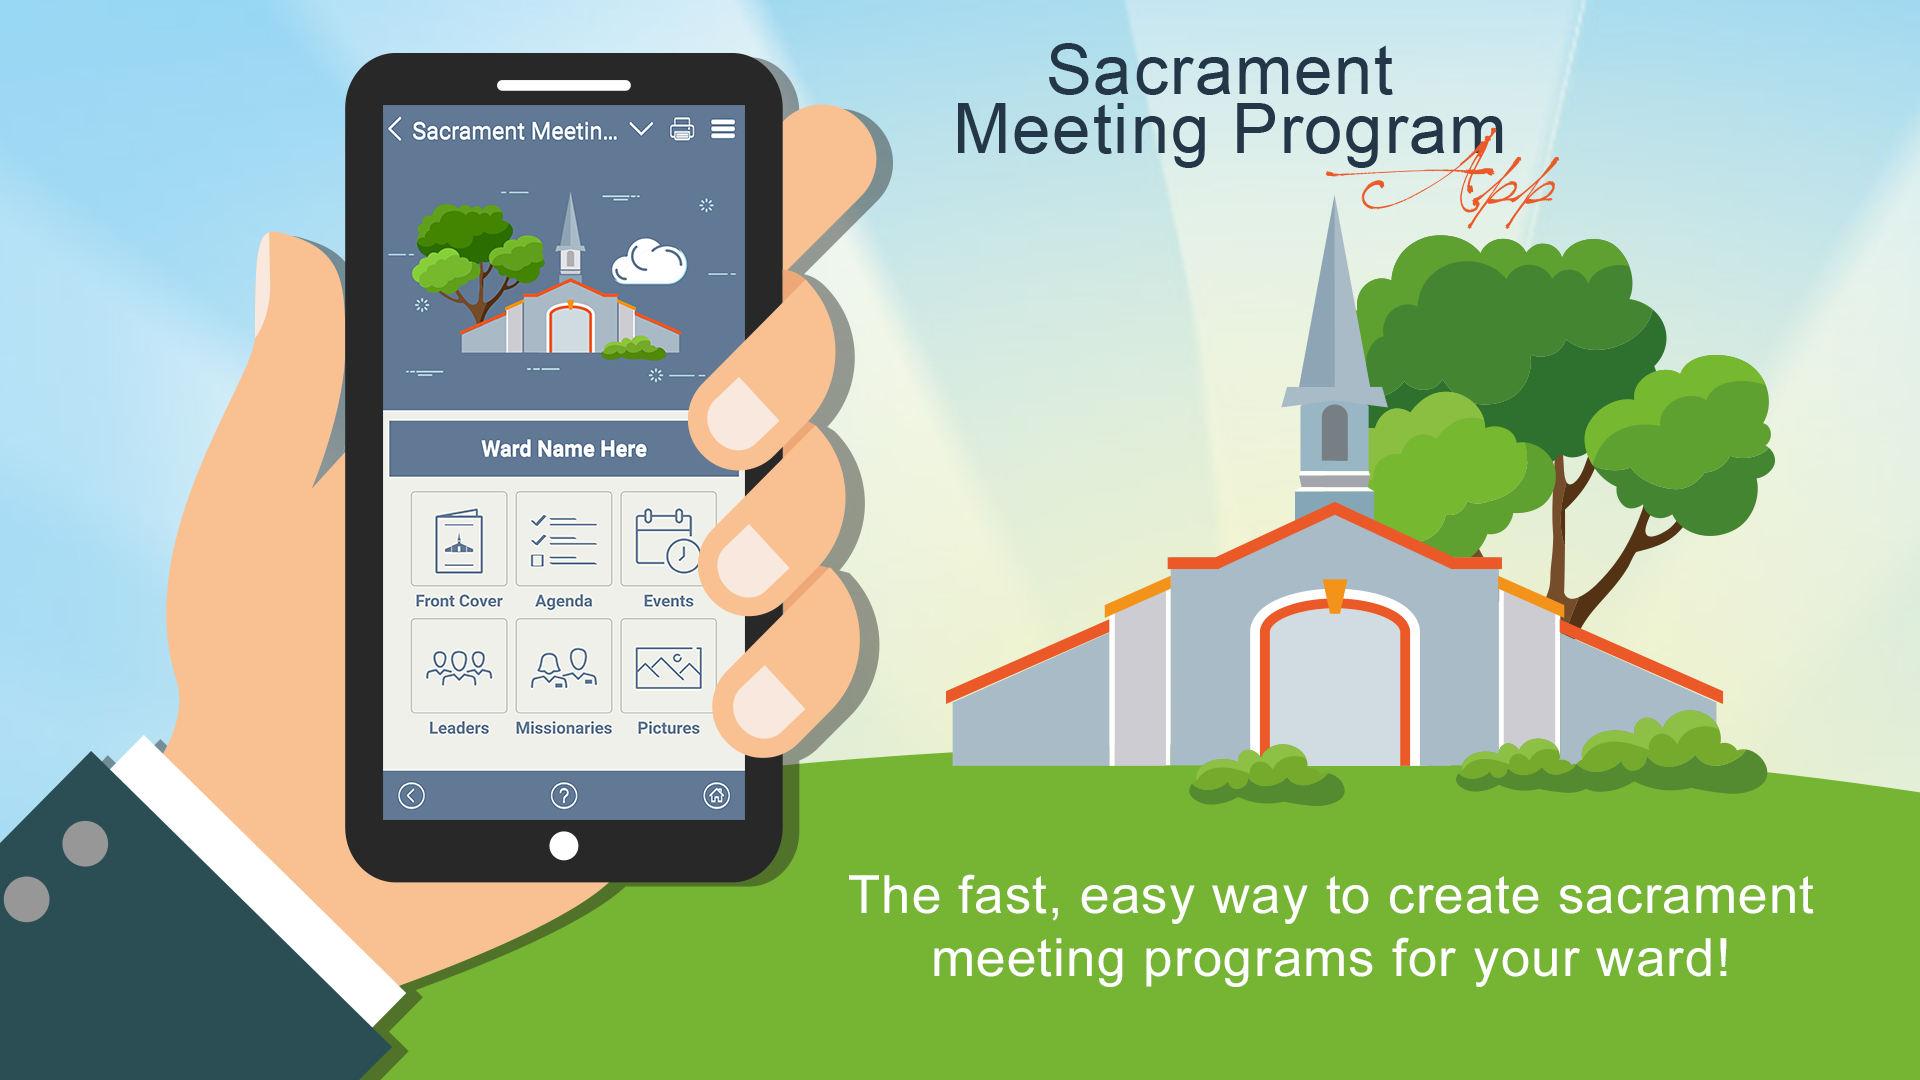 Sacrament Meeting Program